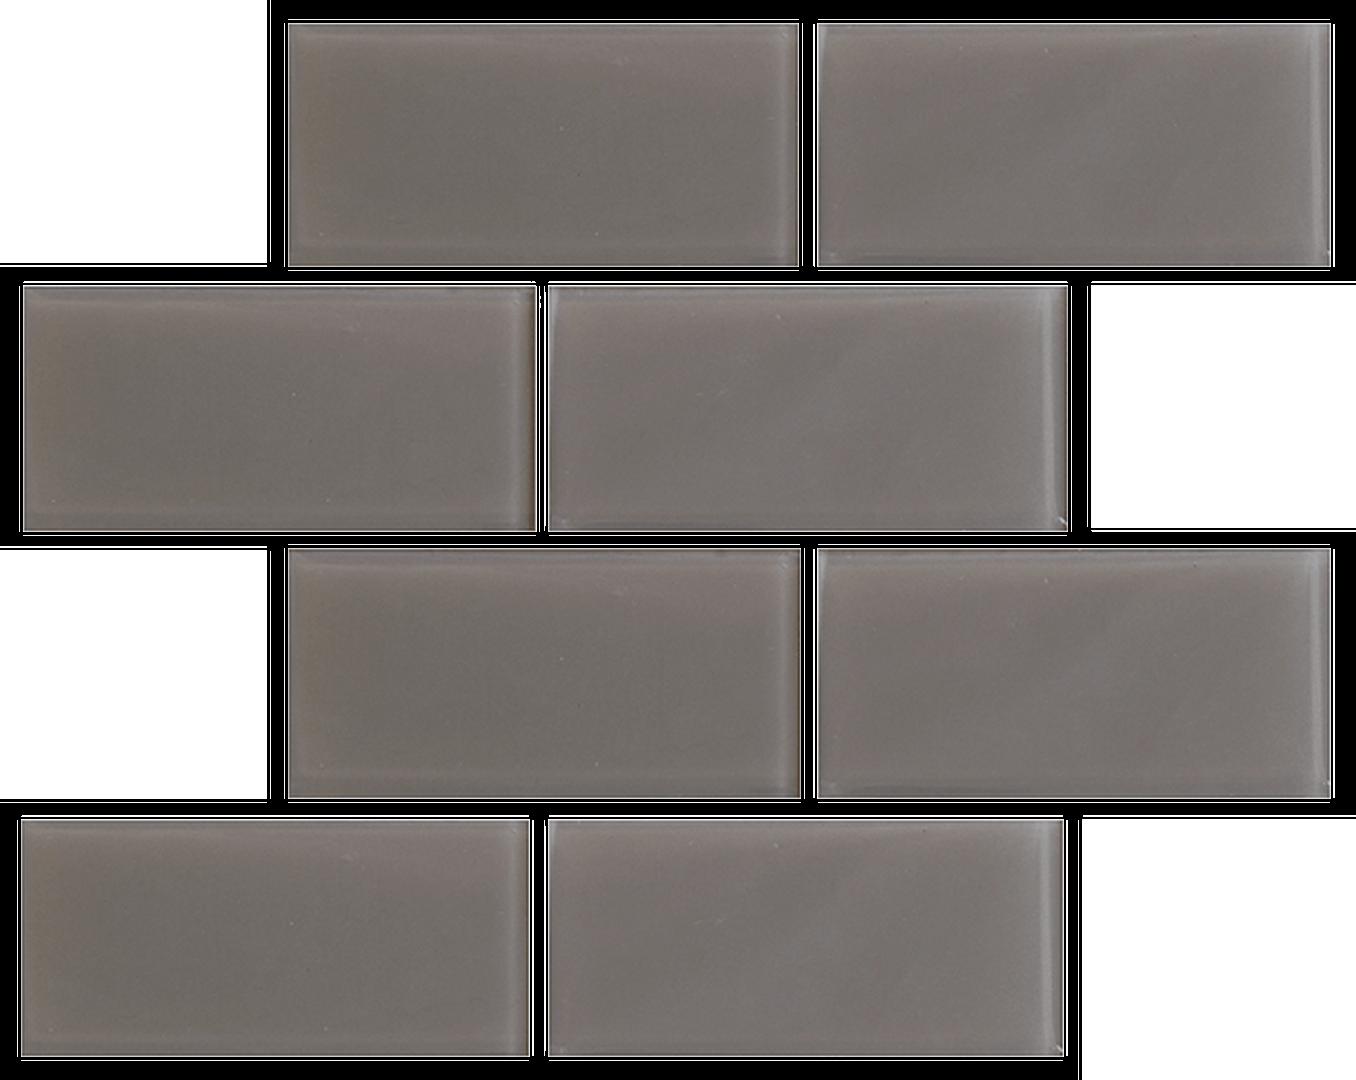 Crystal 3 x 6 Subway Tiles Gravel